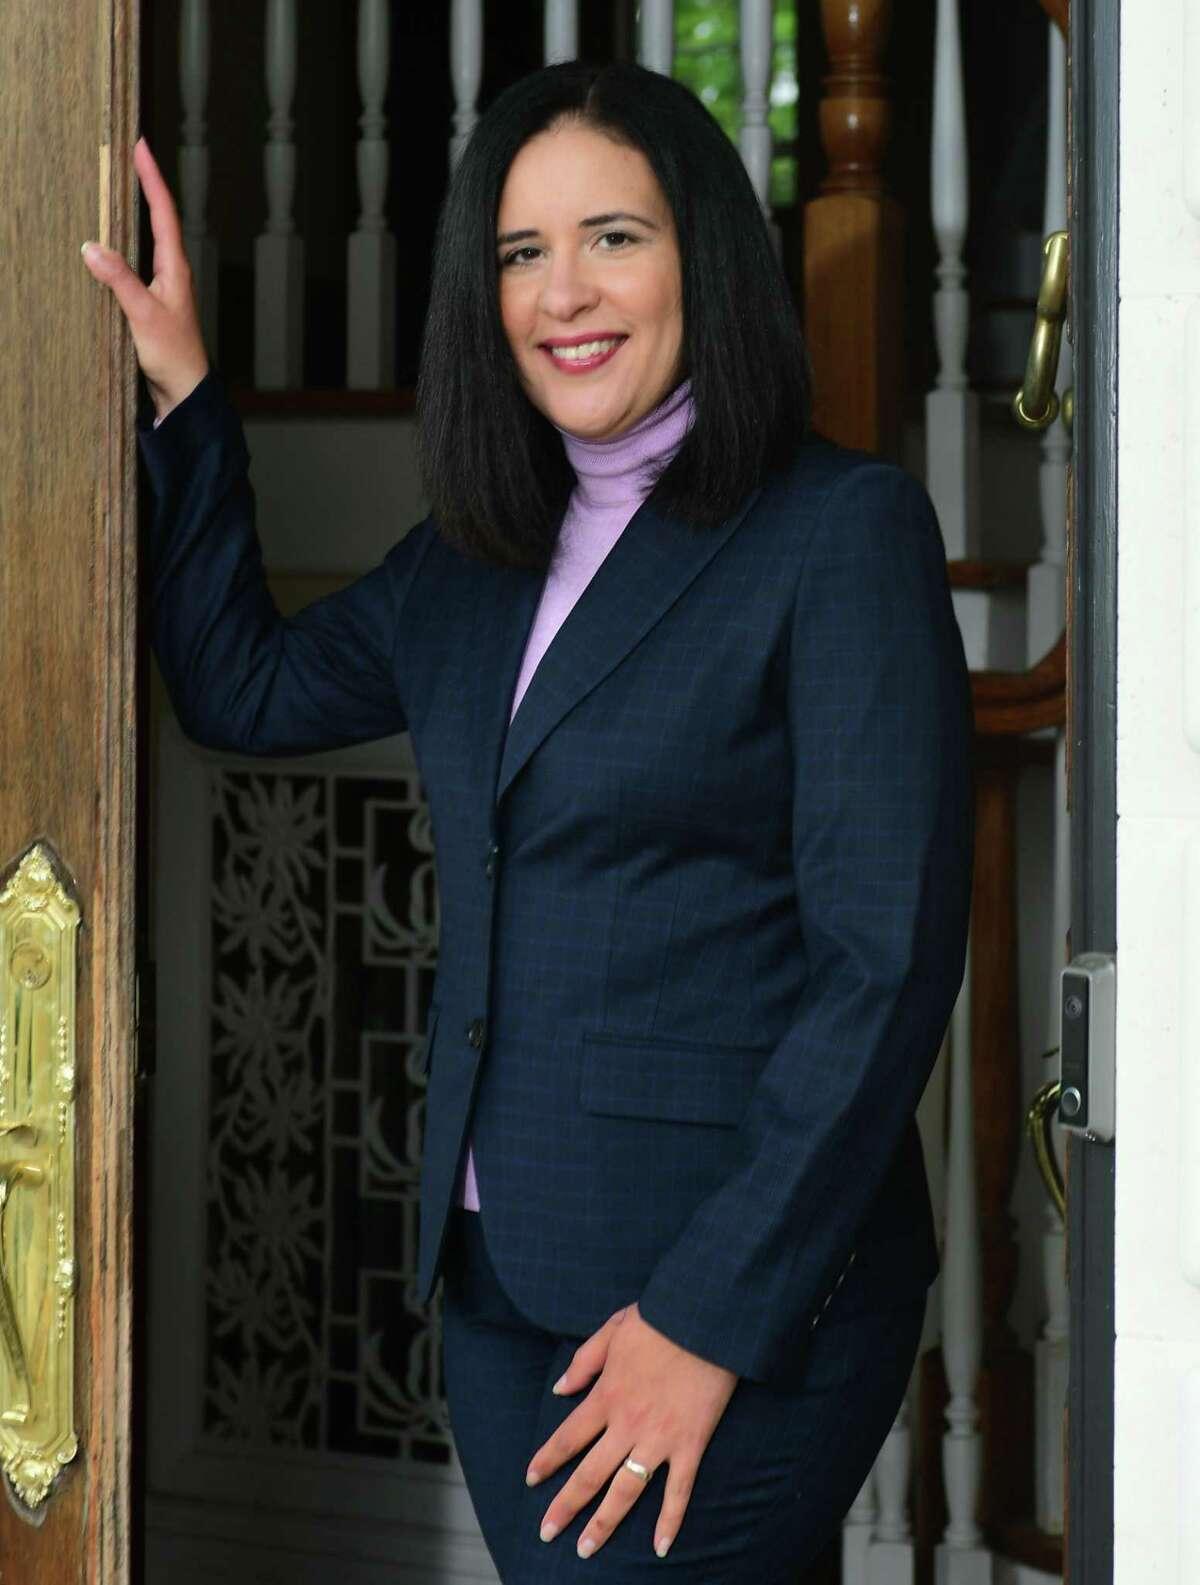 Alexandra Estrella, who began as Norwalk's new superintendent of schools this week, in her New York home in Westchester County.